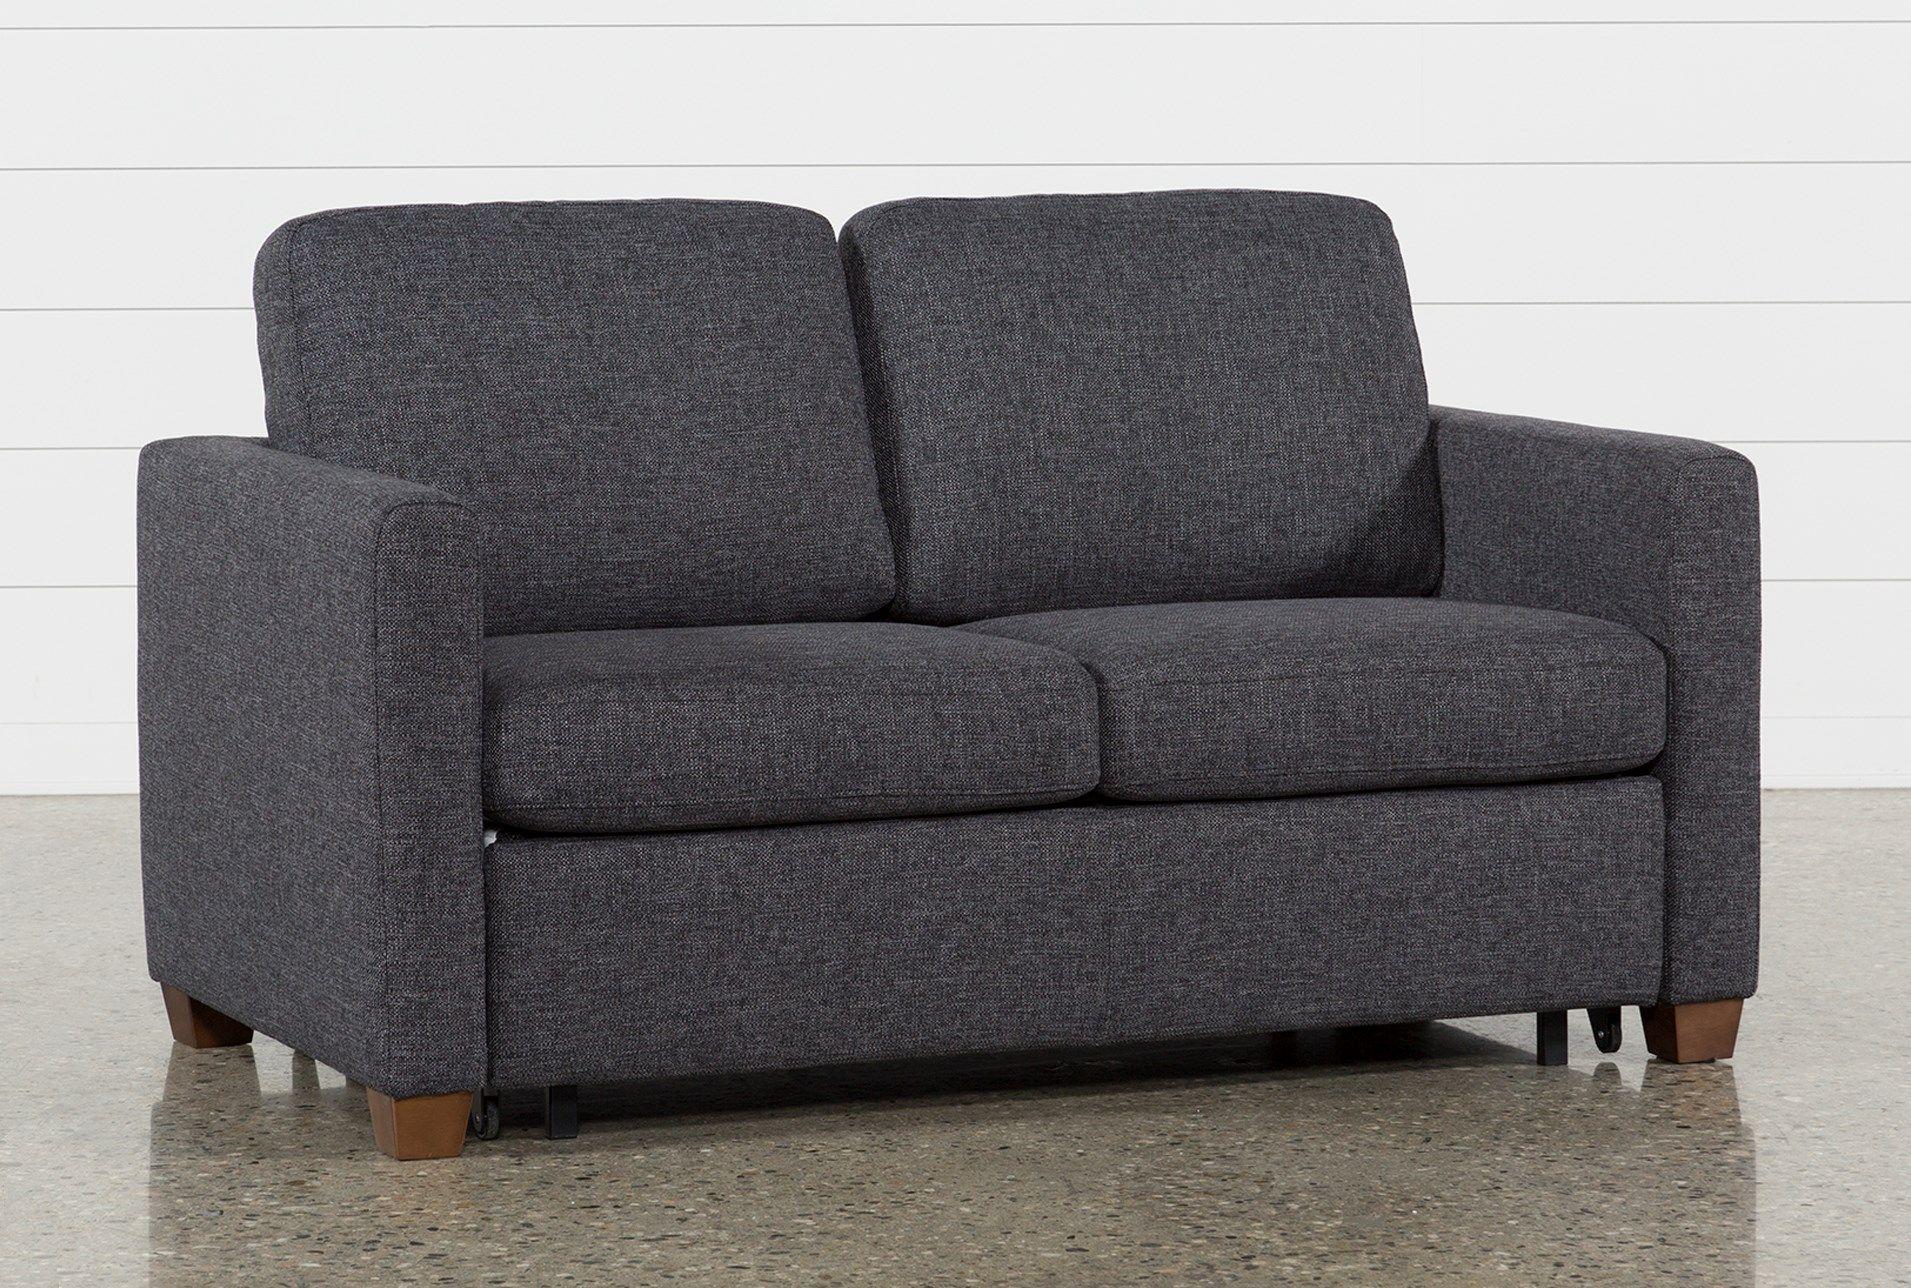 Full Size Loveseat Sleeper Sofa Di 2020